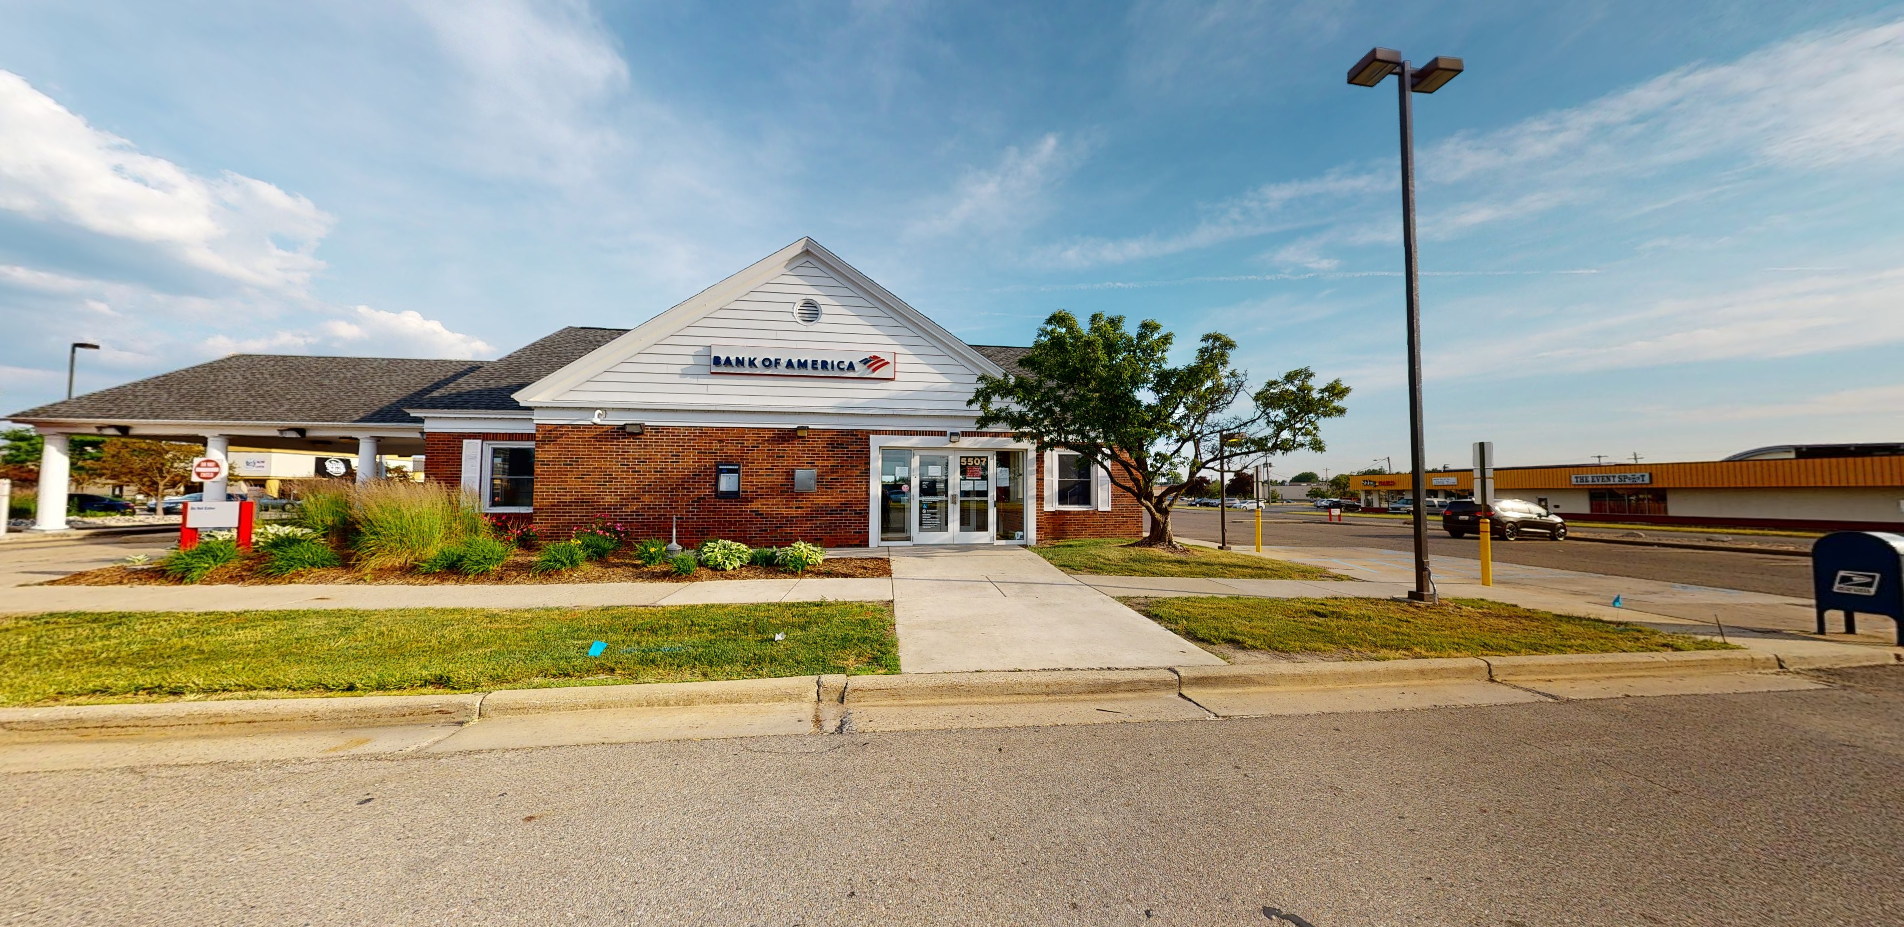 Bank of America financial center with drive-thru ATM | 5507 W Saginaw Hwy, Lansing, MI 48917